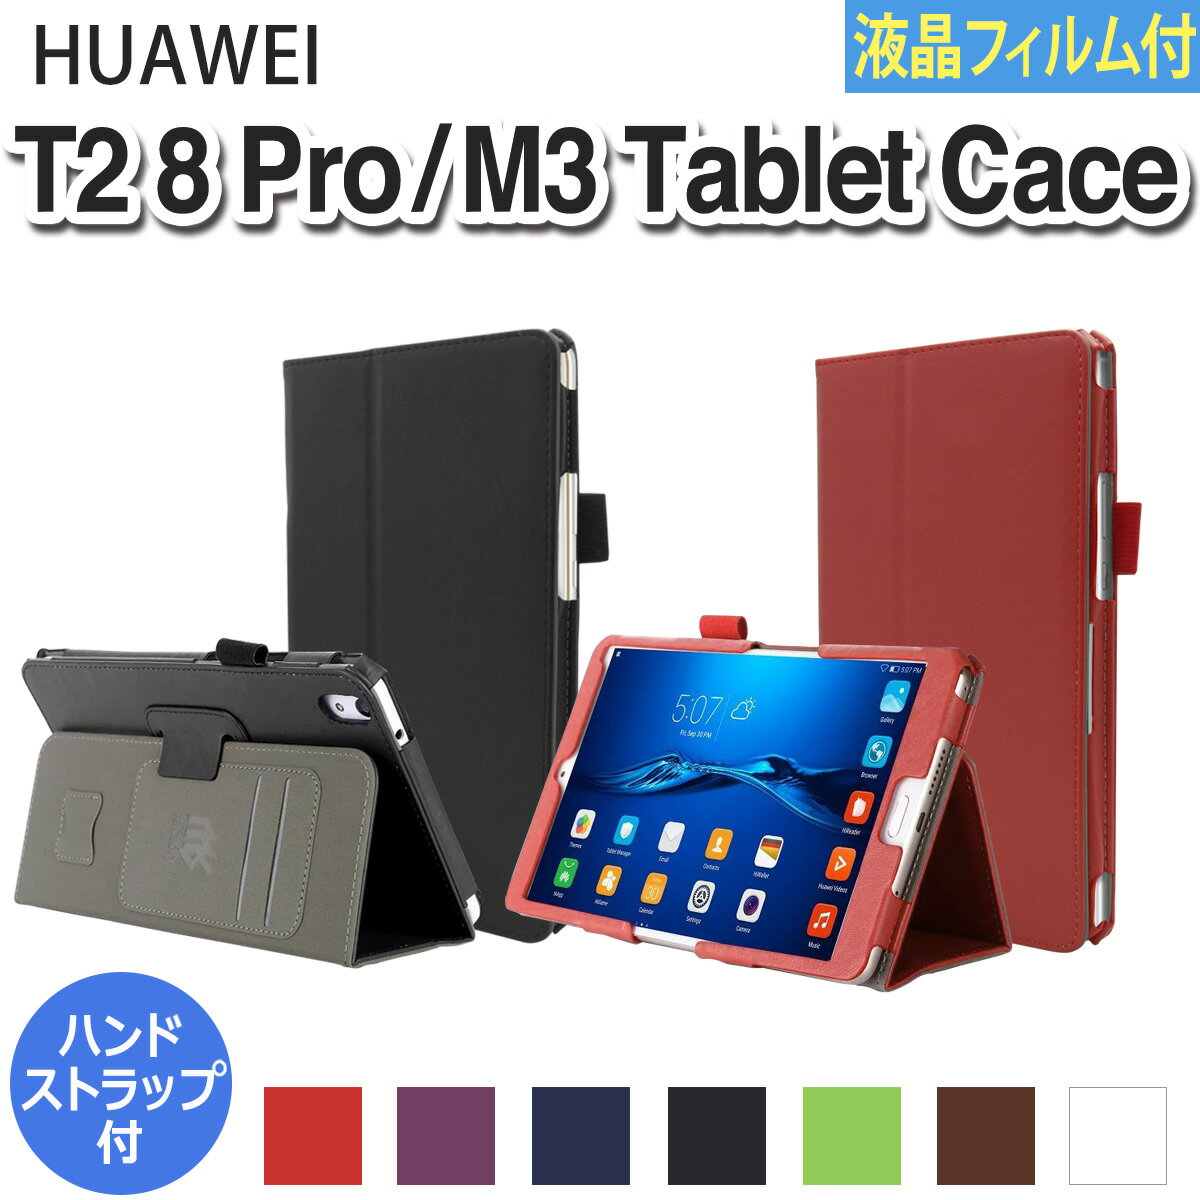 6fc73a6d23 docomo dtab Compact d-01J ケース HUAWEI MediaPad M3 8.4インチ MediaPad T2 8 Pro